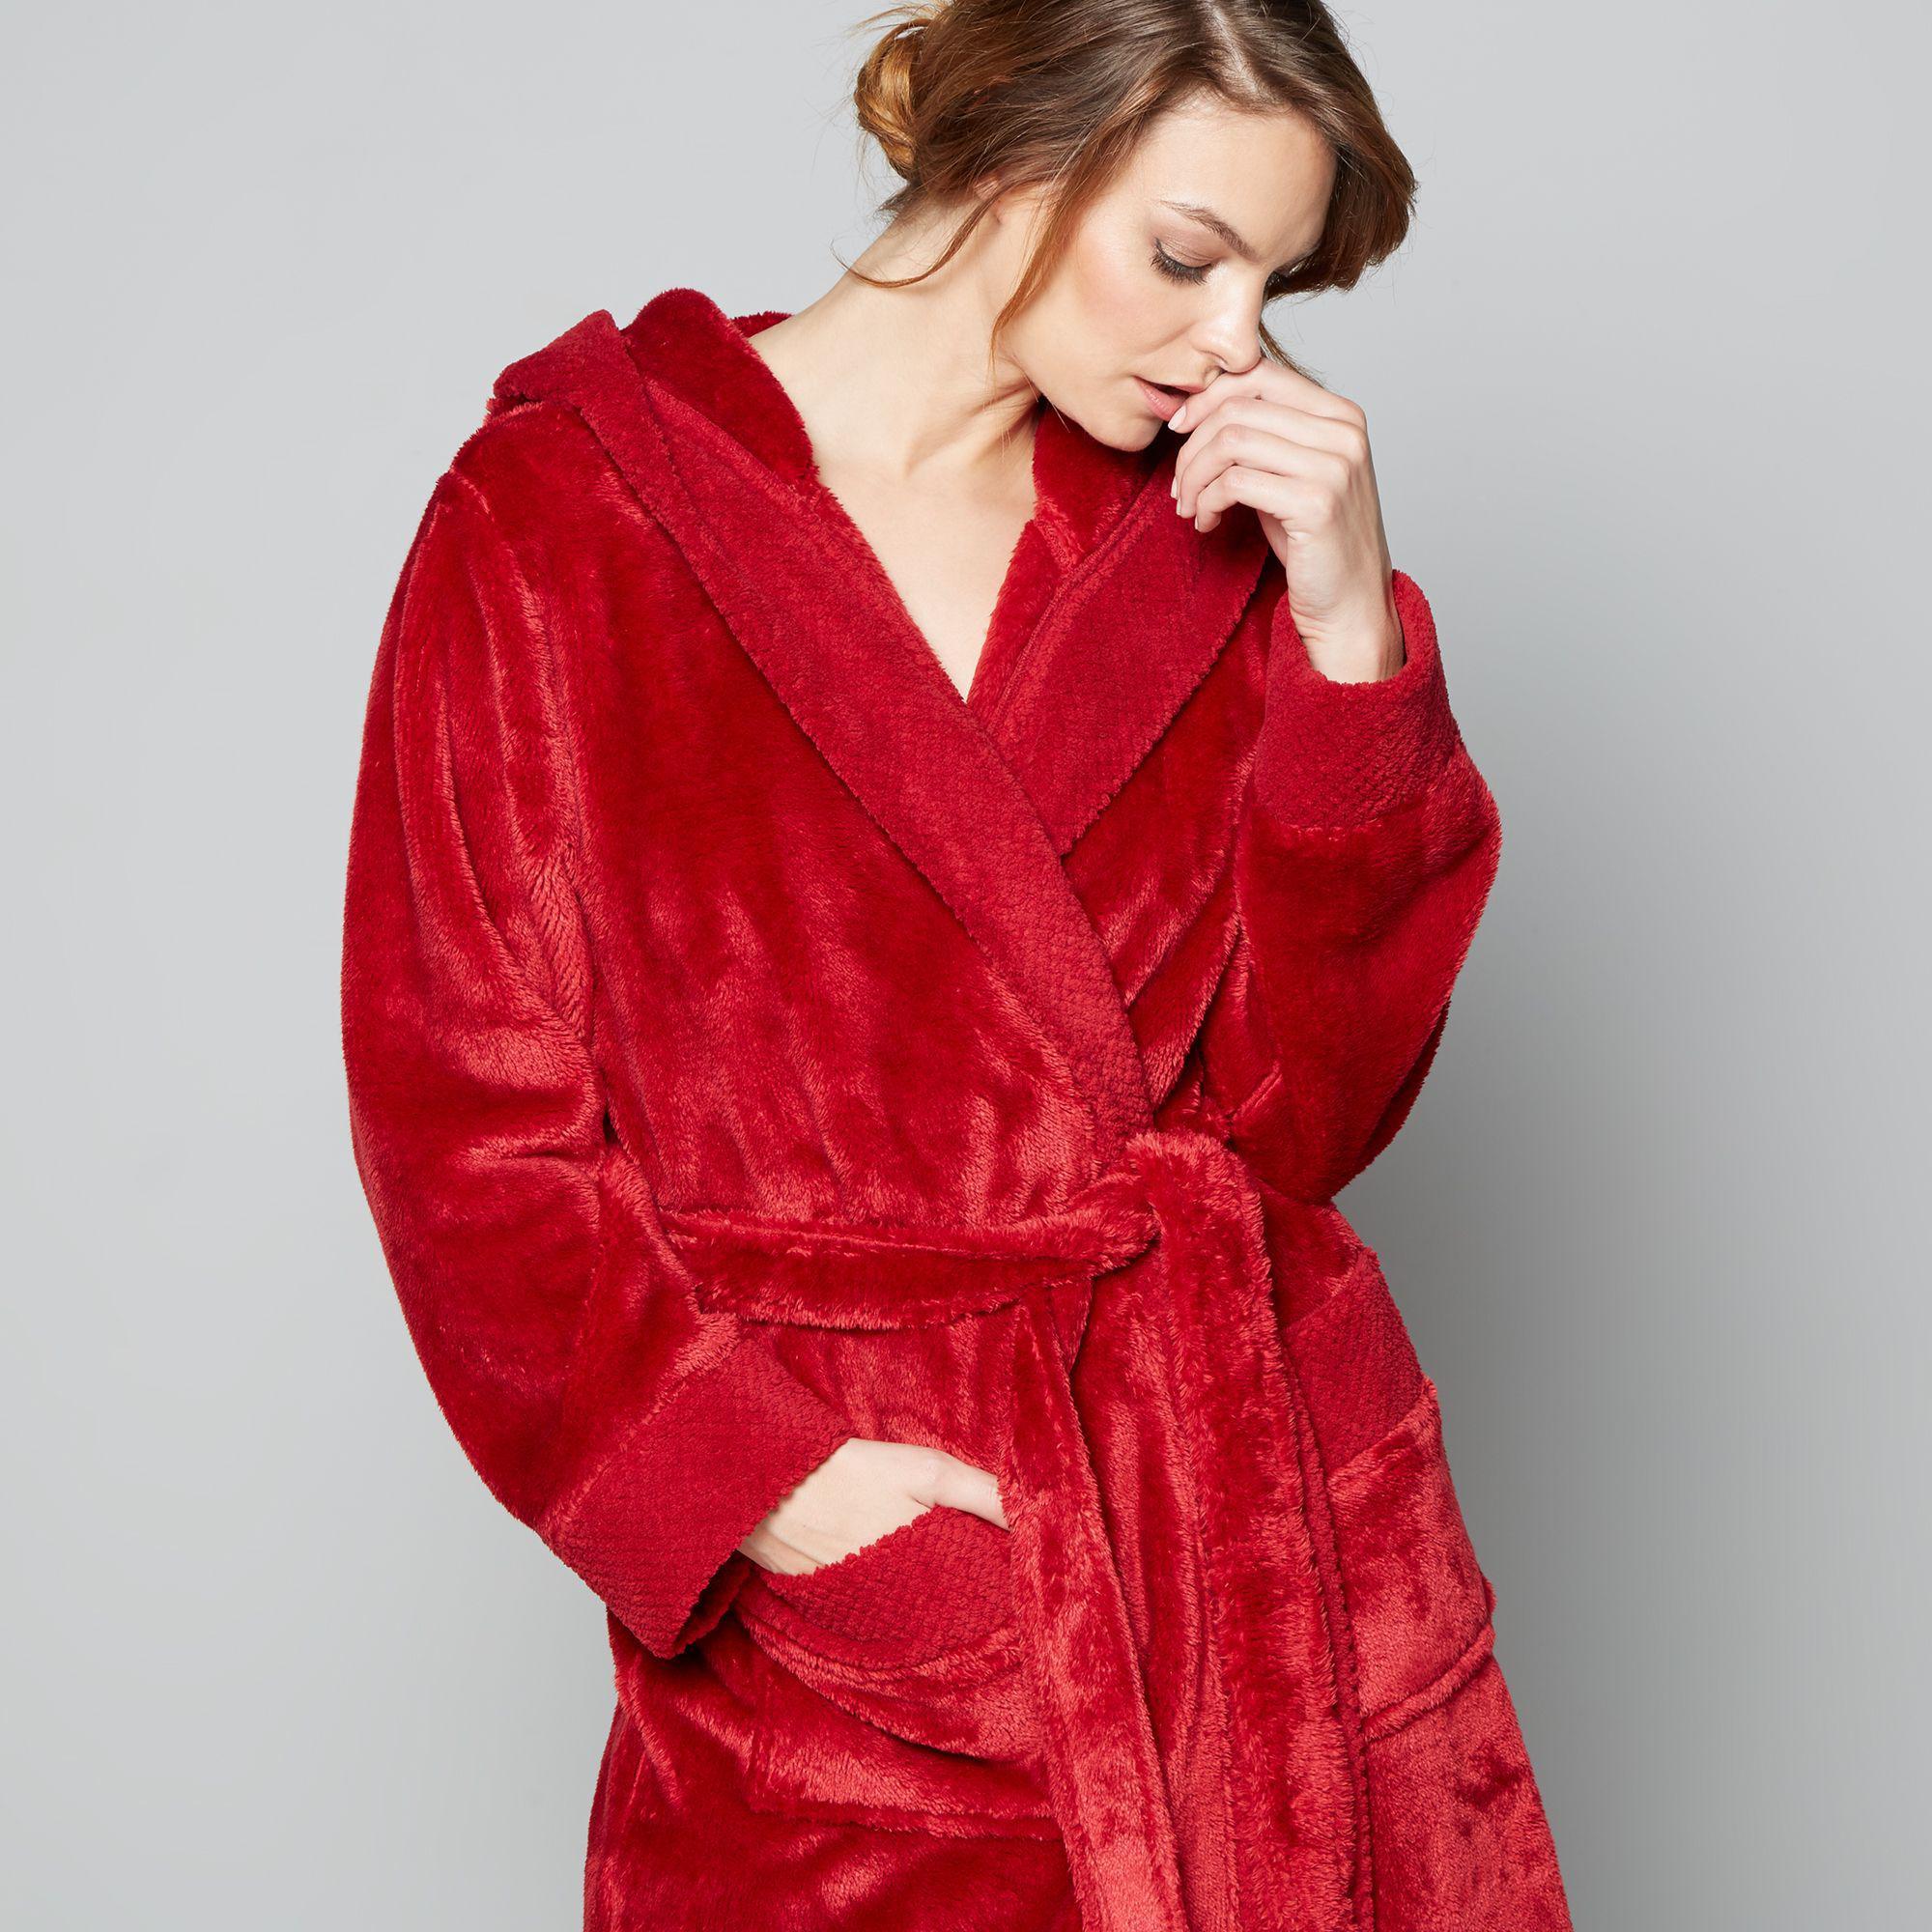 J By Jasper Conran Red Fleece Dressing Gown in Red - Lyst 617e6dc1c